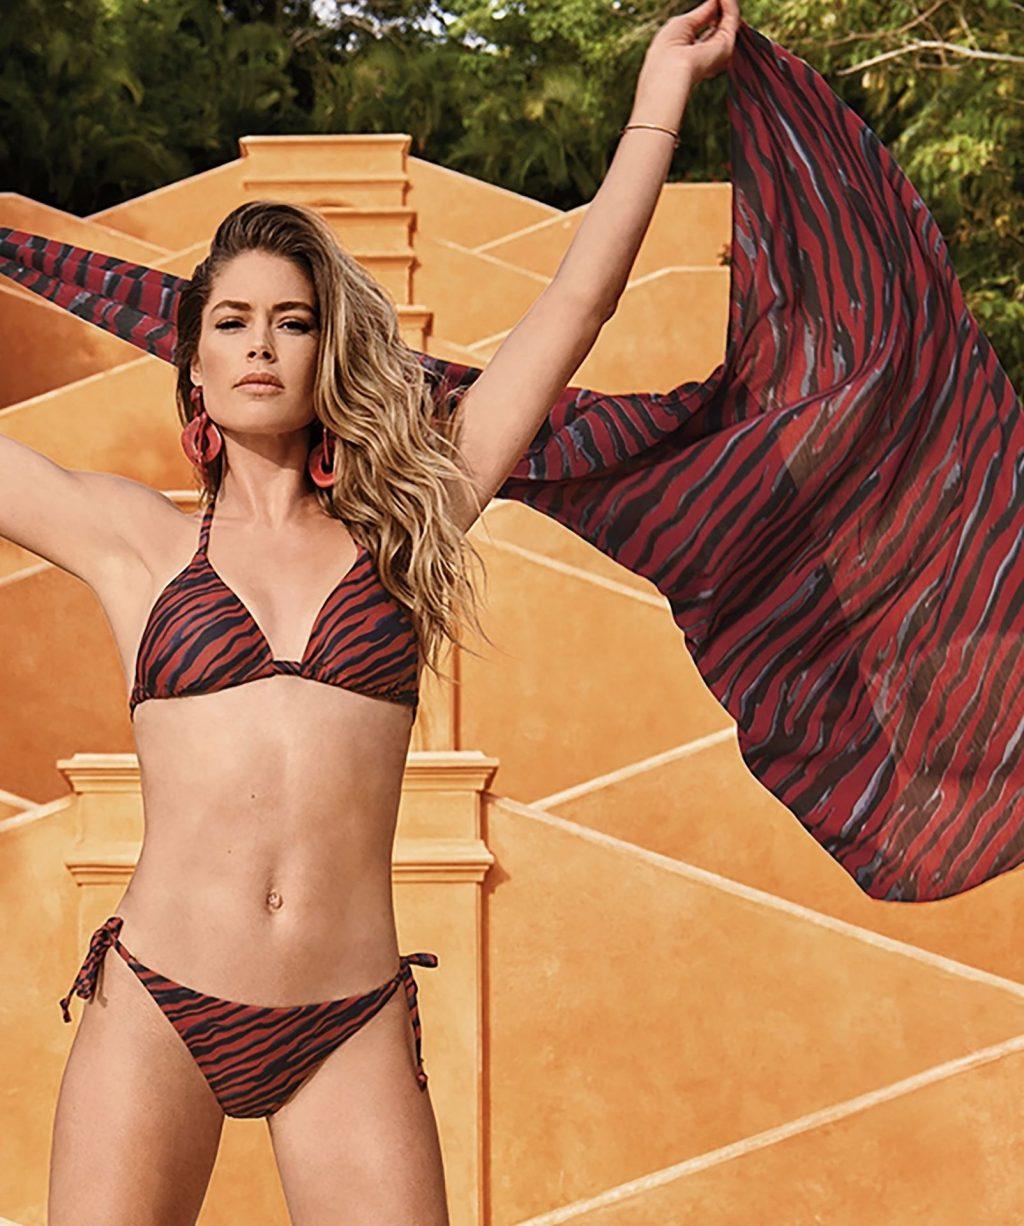 Doutzen Kroes Presents Her New Sexy Swimsuit Campaign (7 Photos)